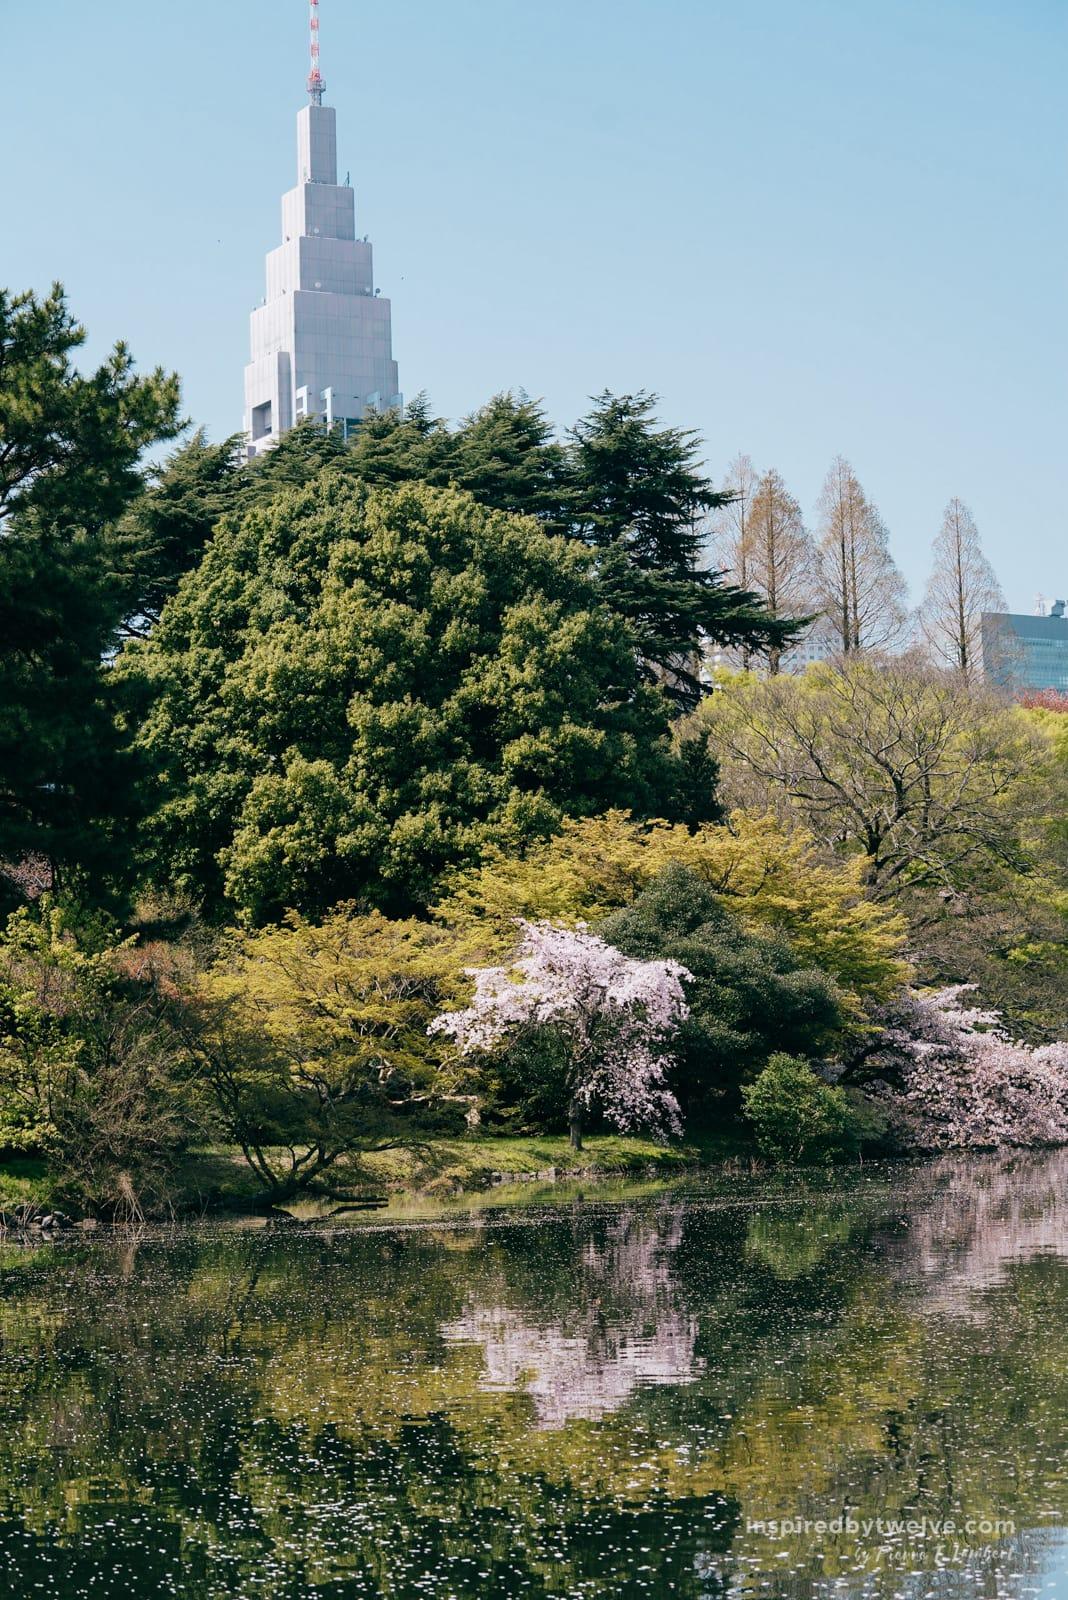 Shinjuku Gyoen, Tokyo Travel Guide, 24 Hours in Tokyo, what to do in tokyo, tokyo itinerary